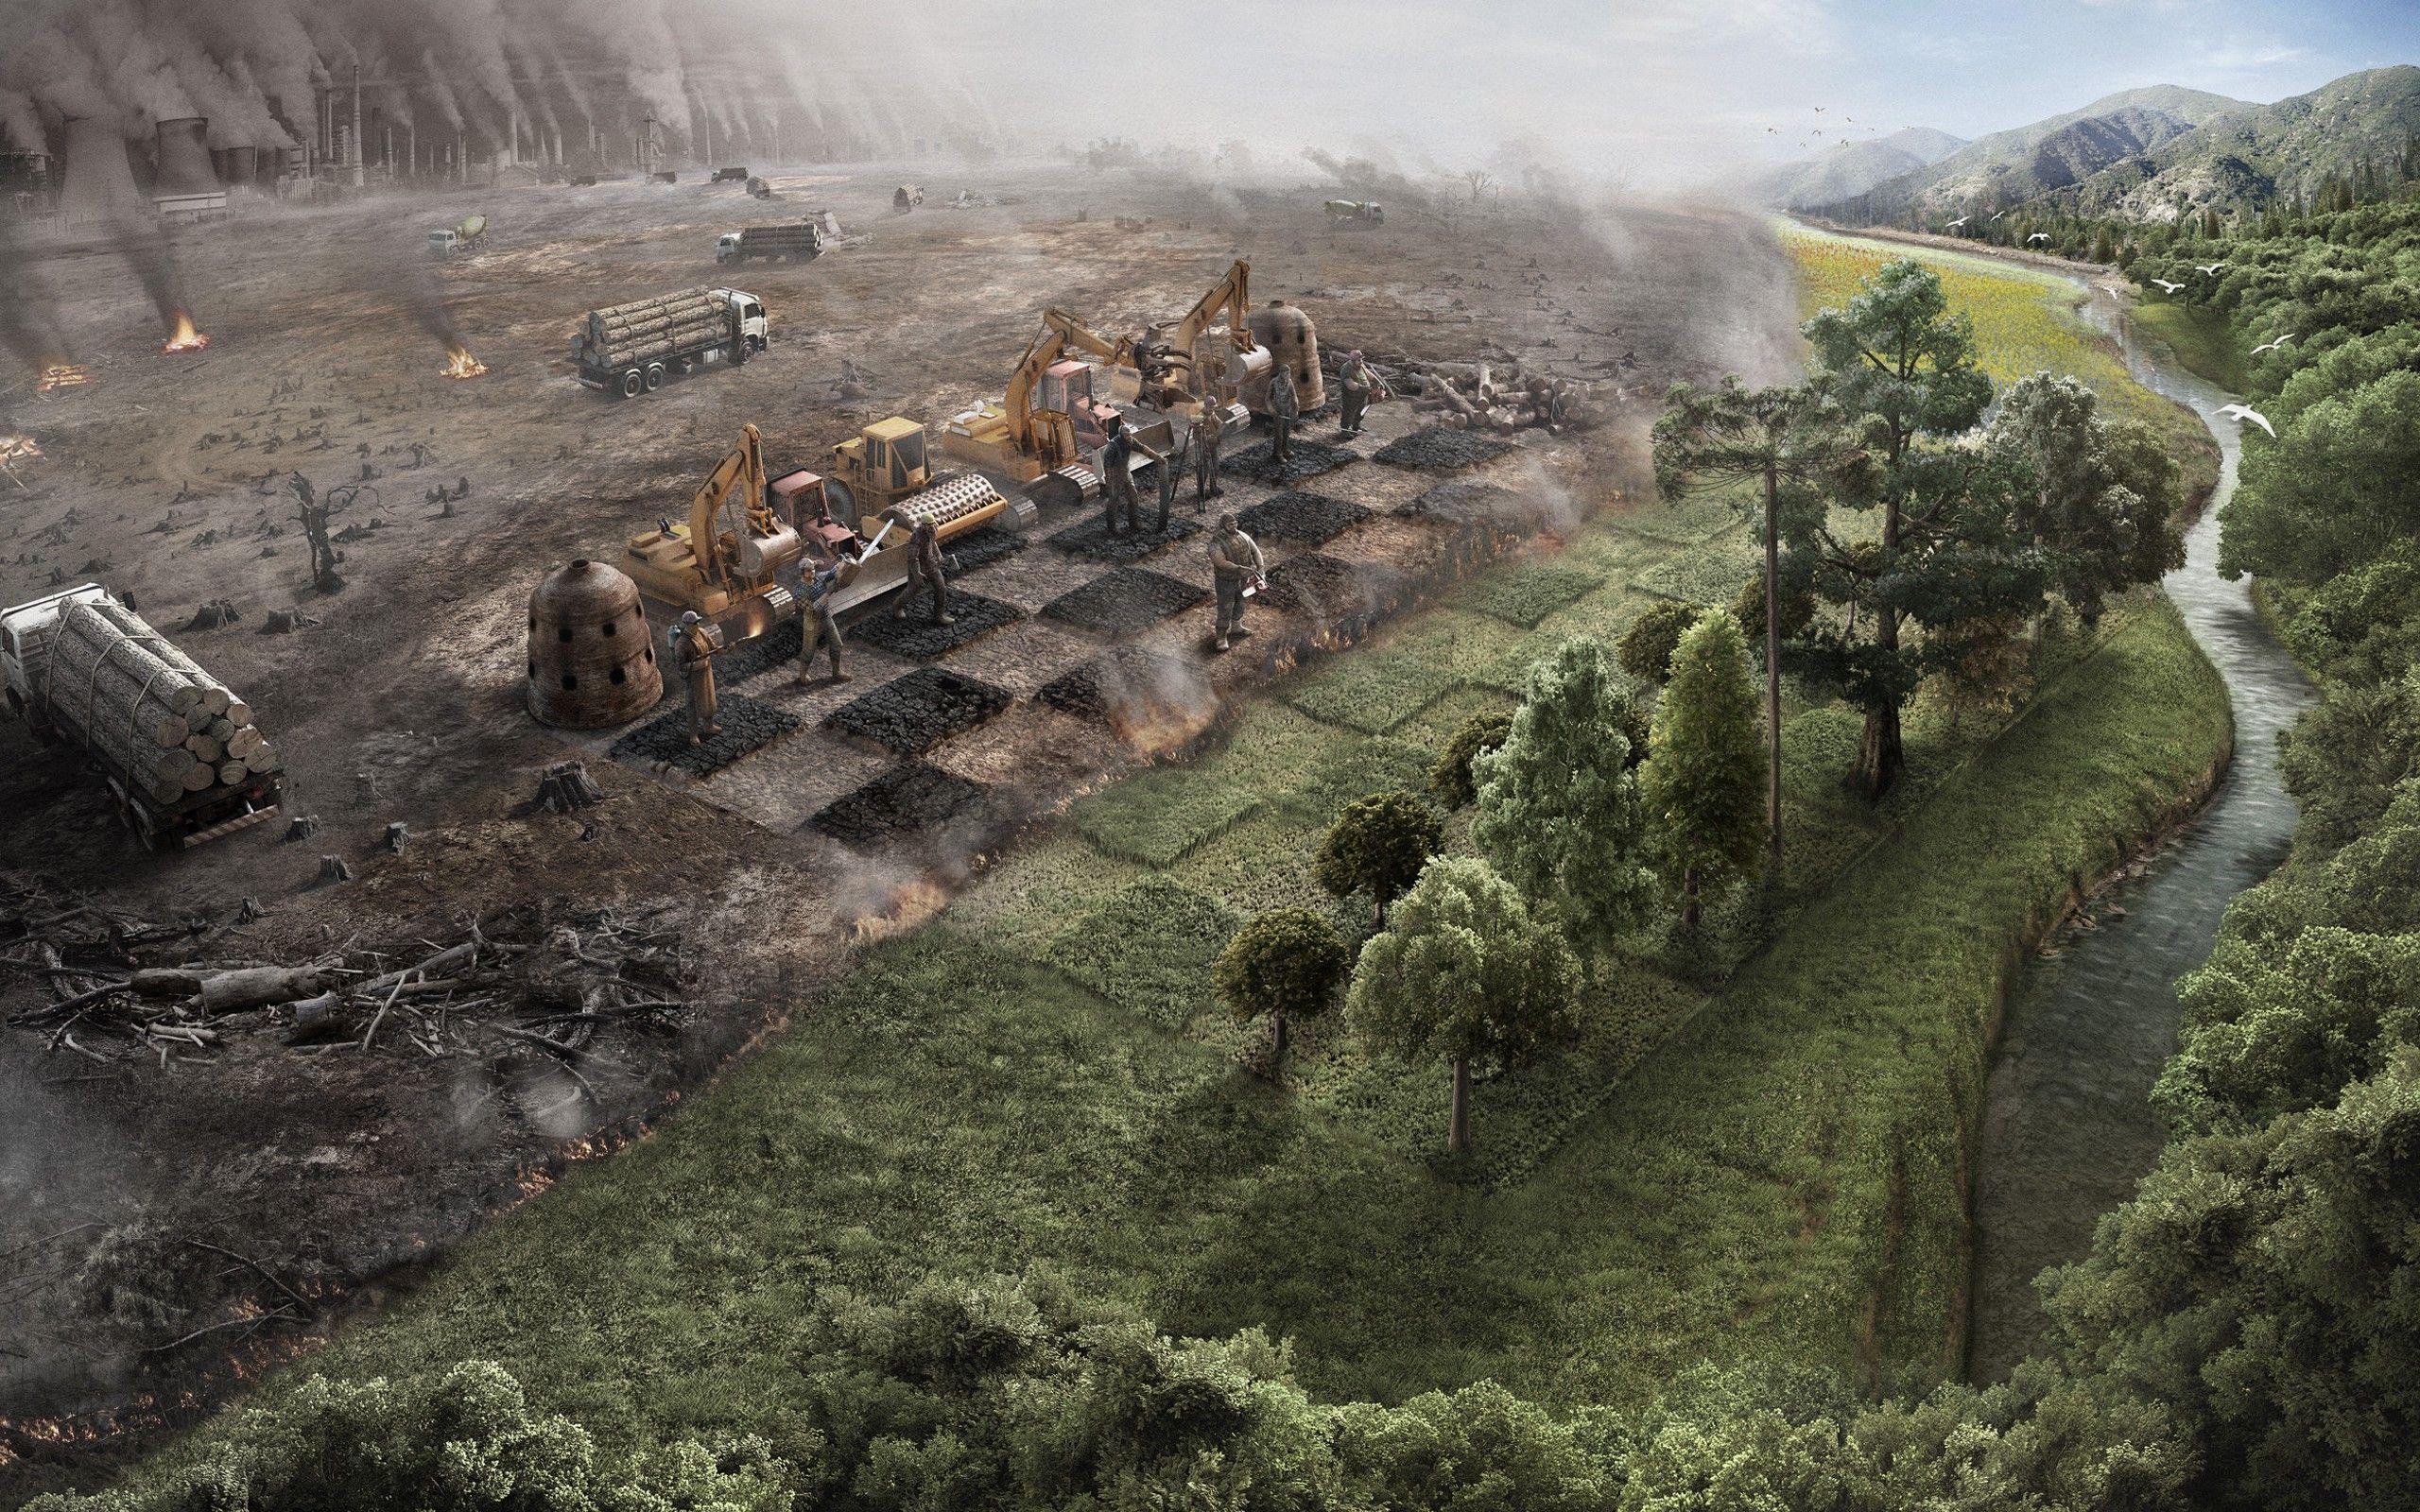 картинки цивилизация и природа богатый